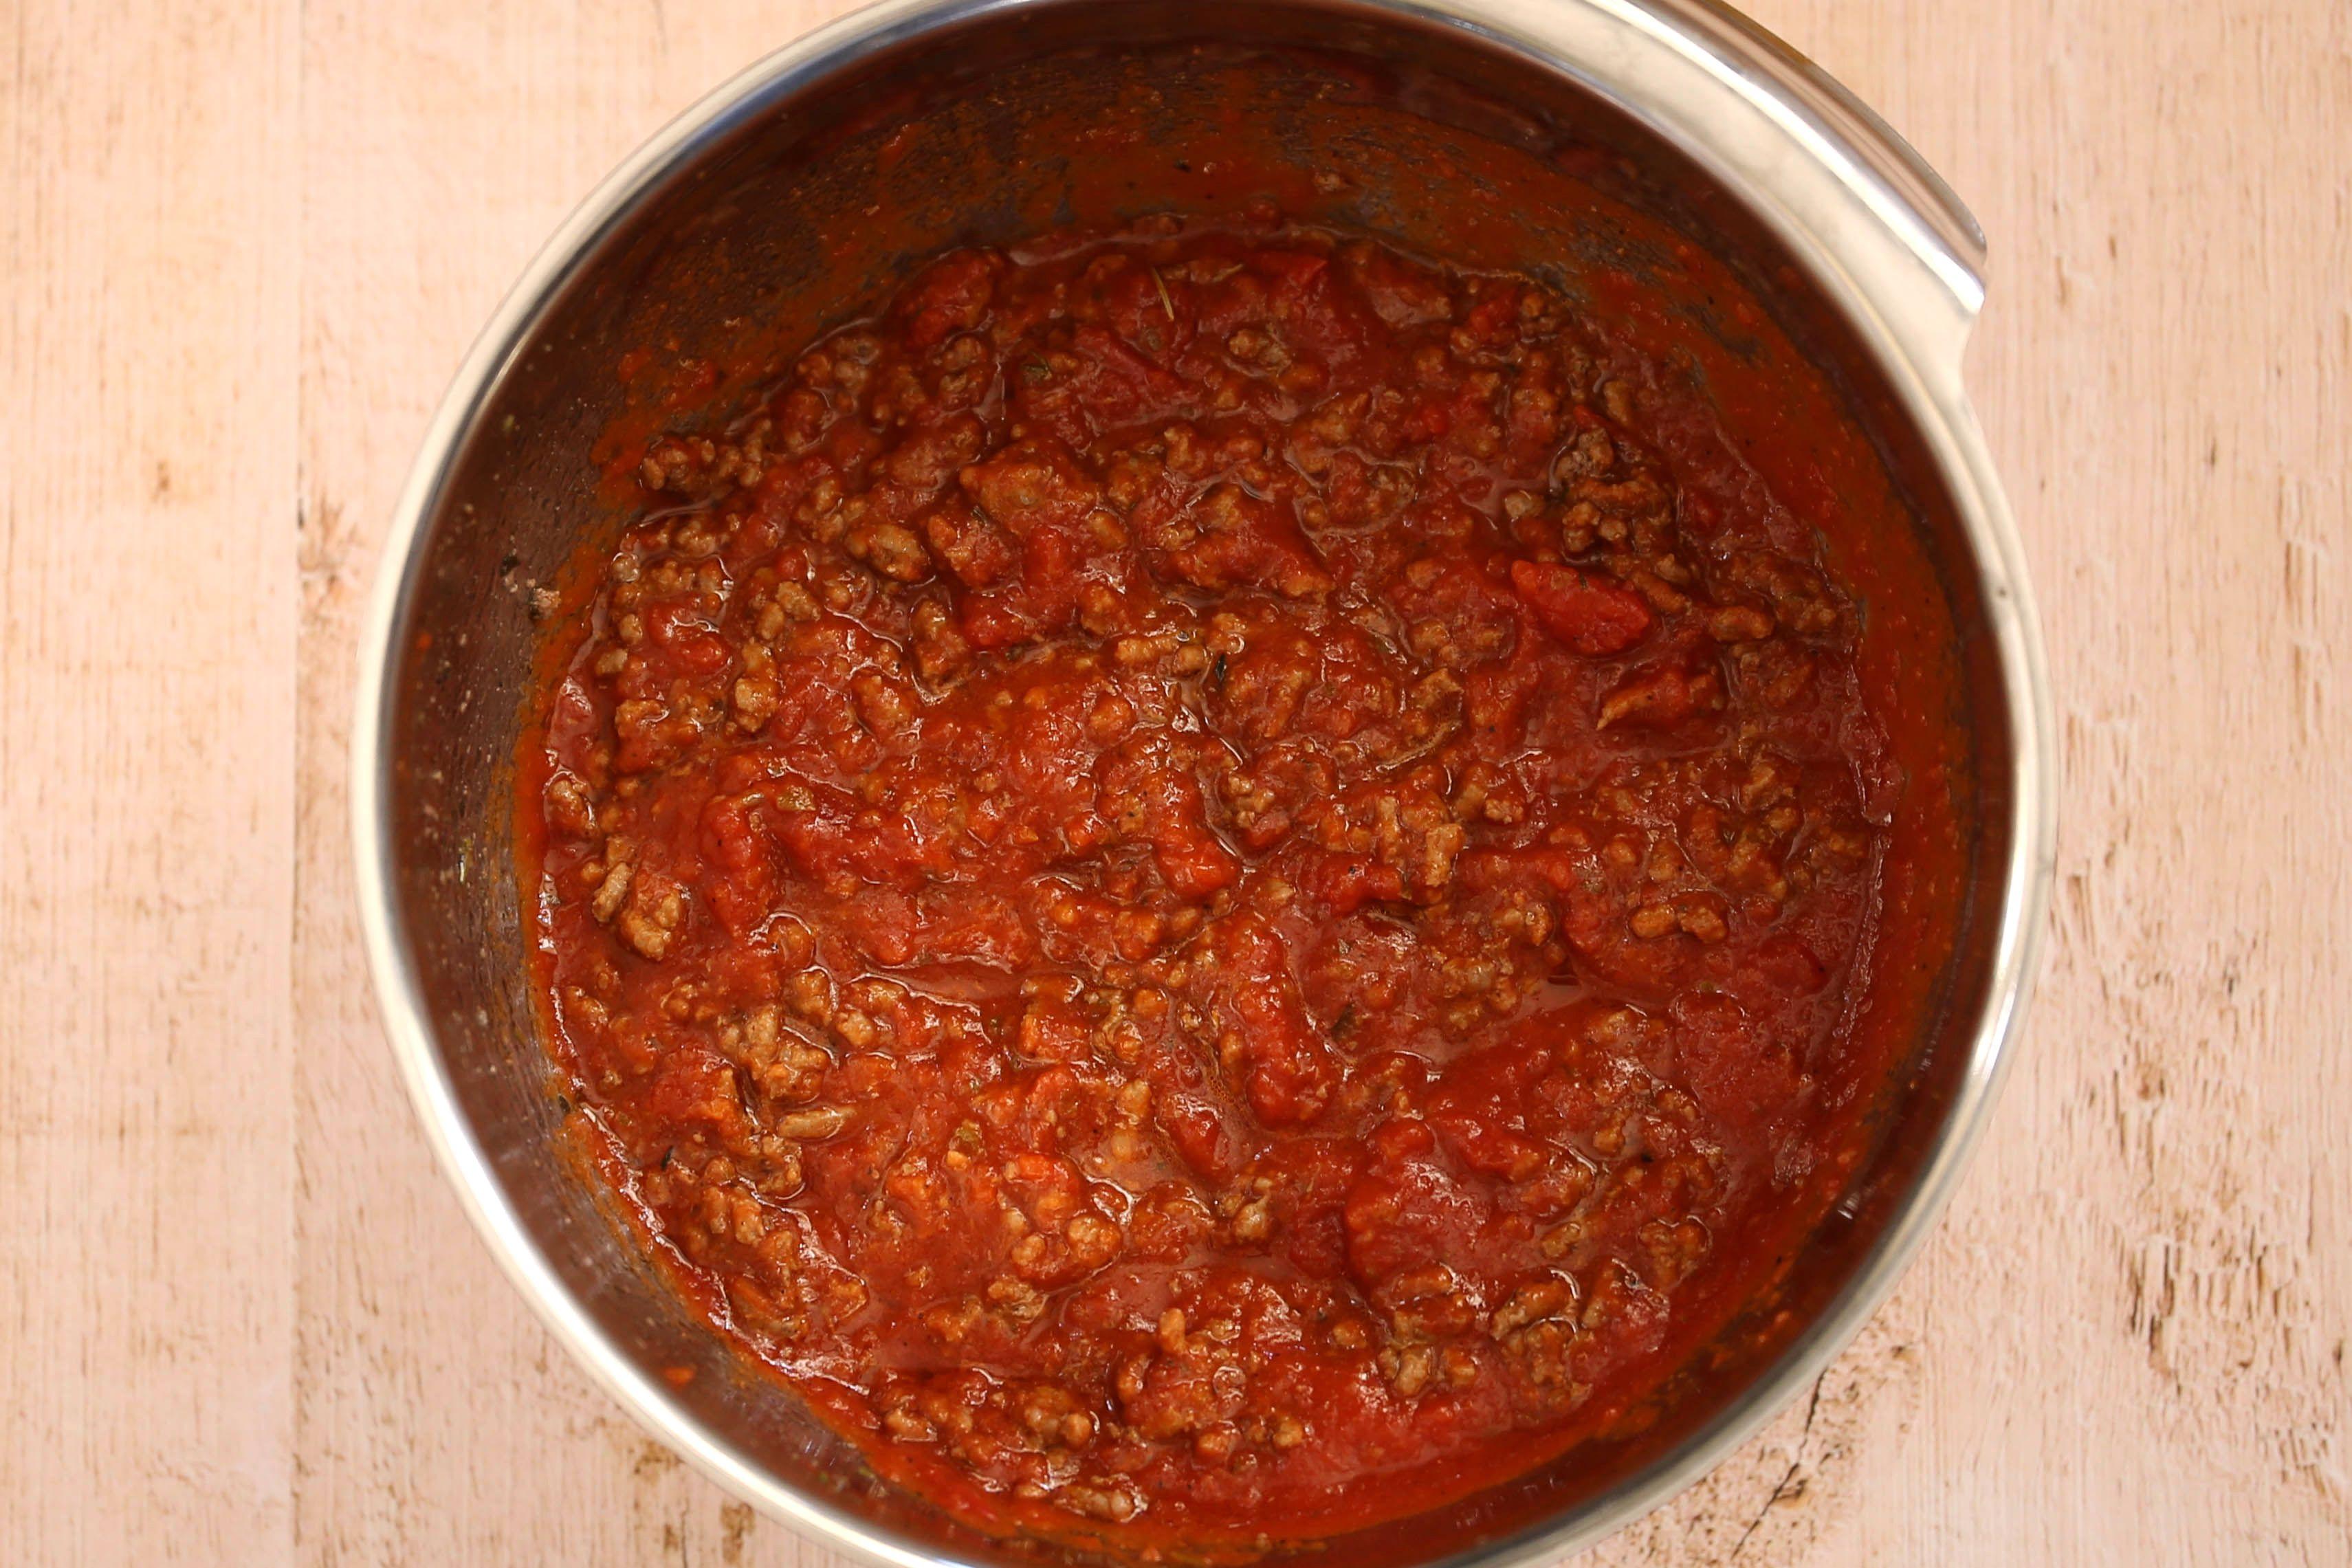 Combine the ground beef and marinara sauce.